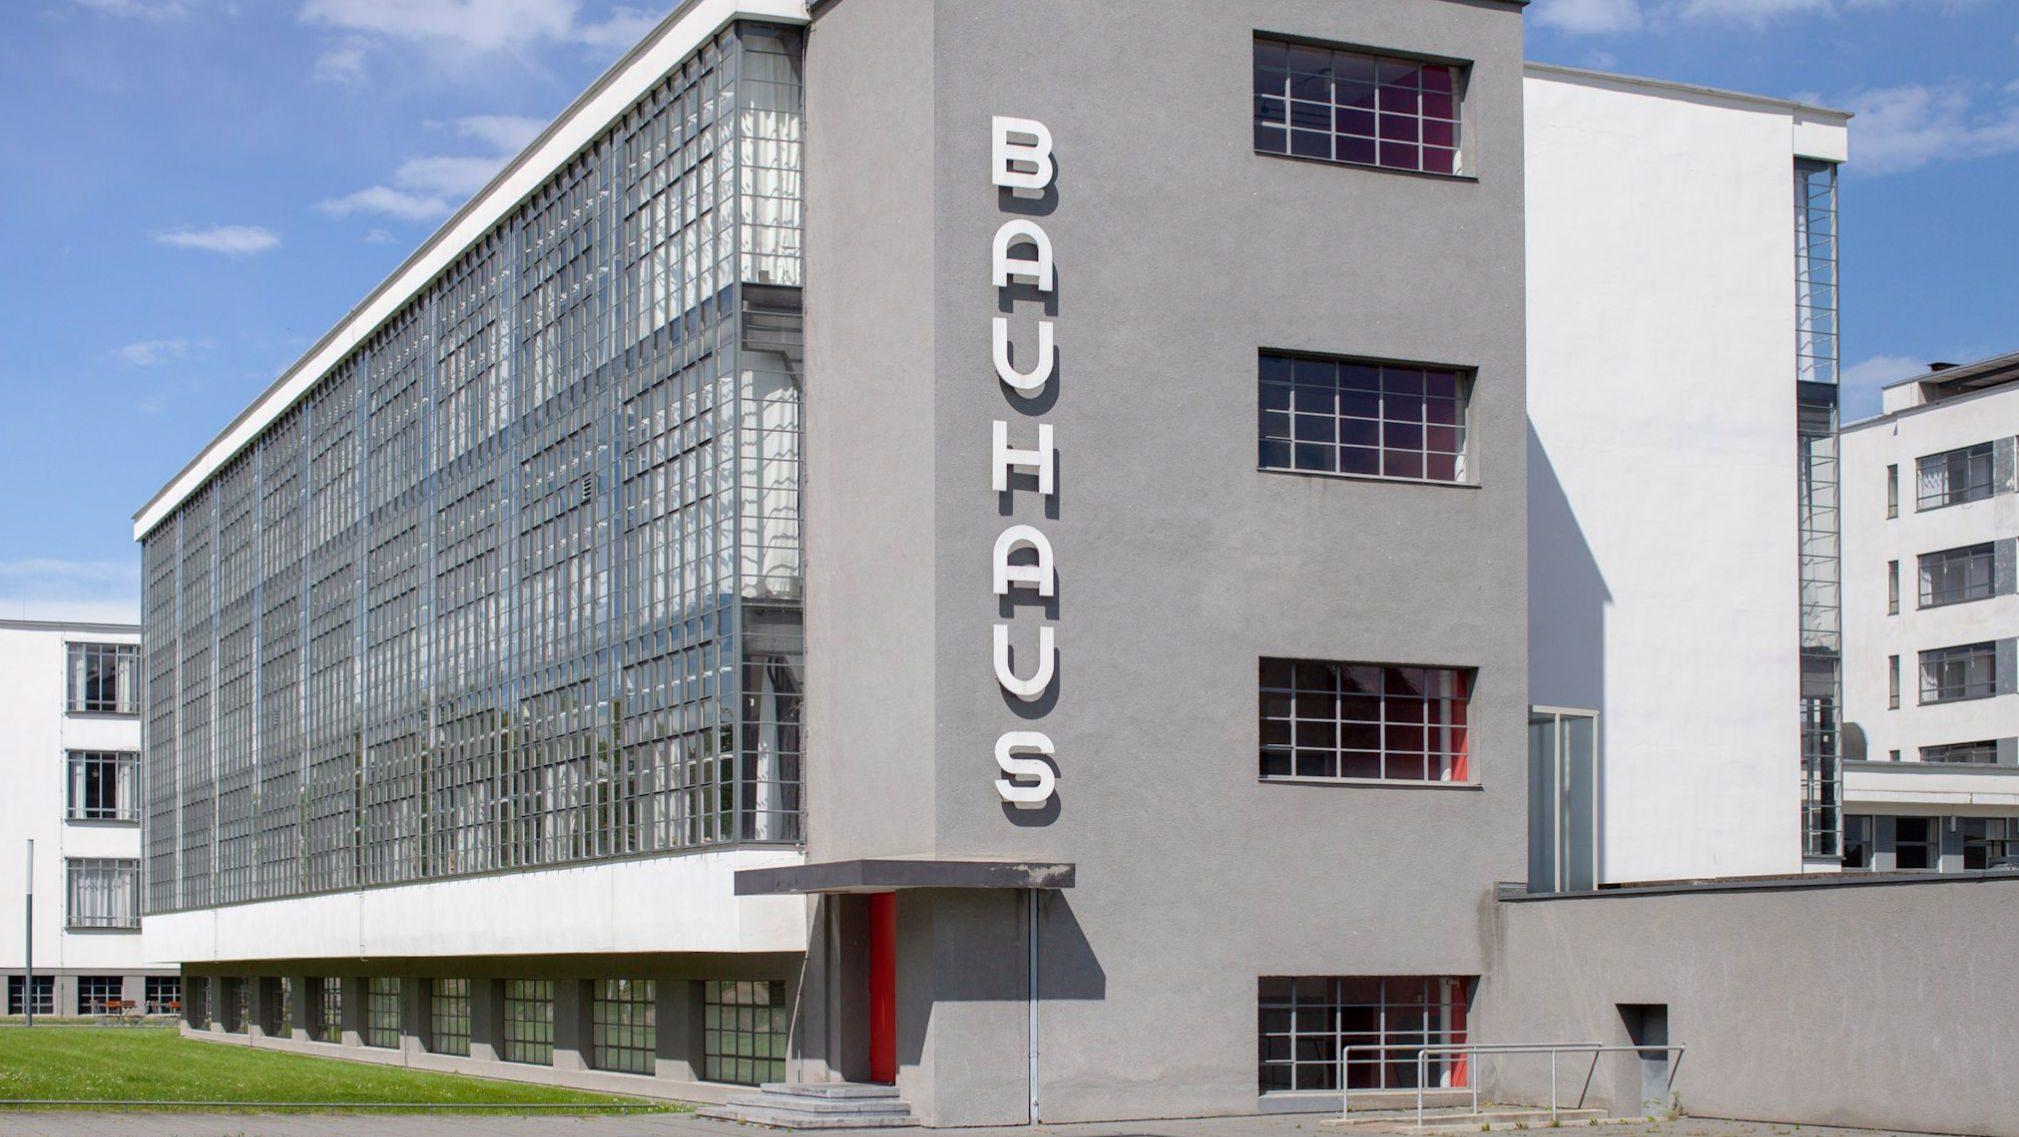 Bauhaus design has a legacy beyond its style